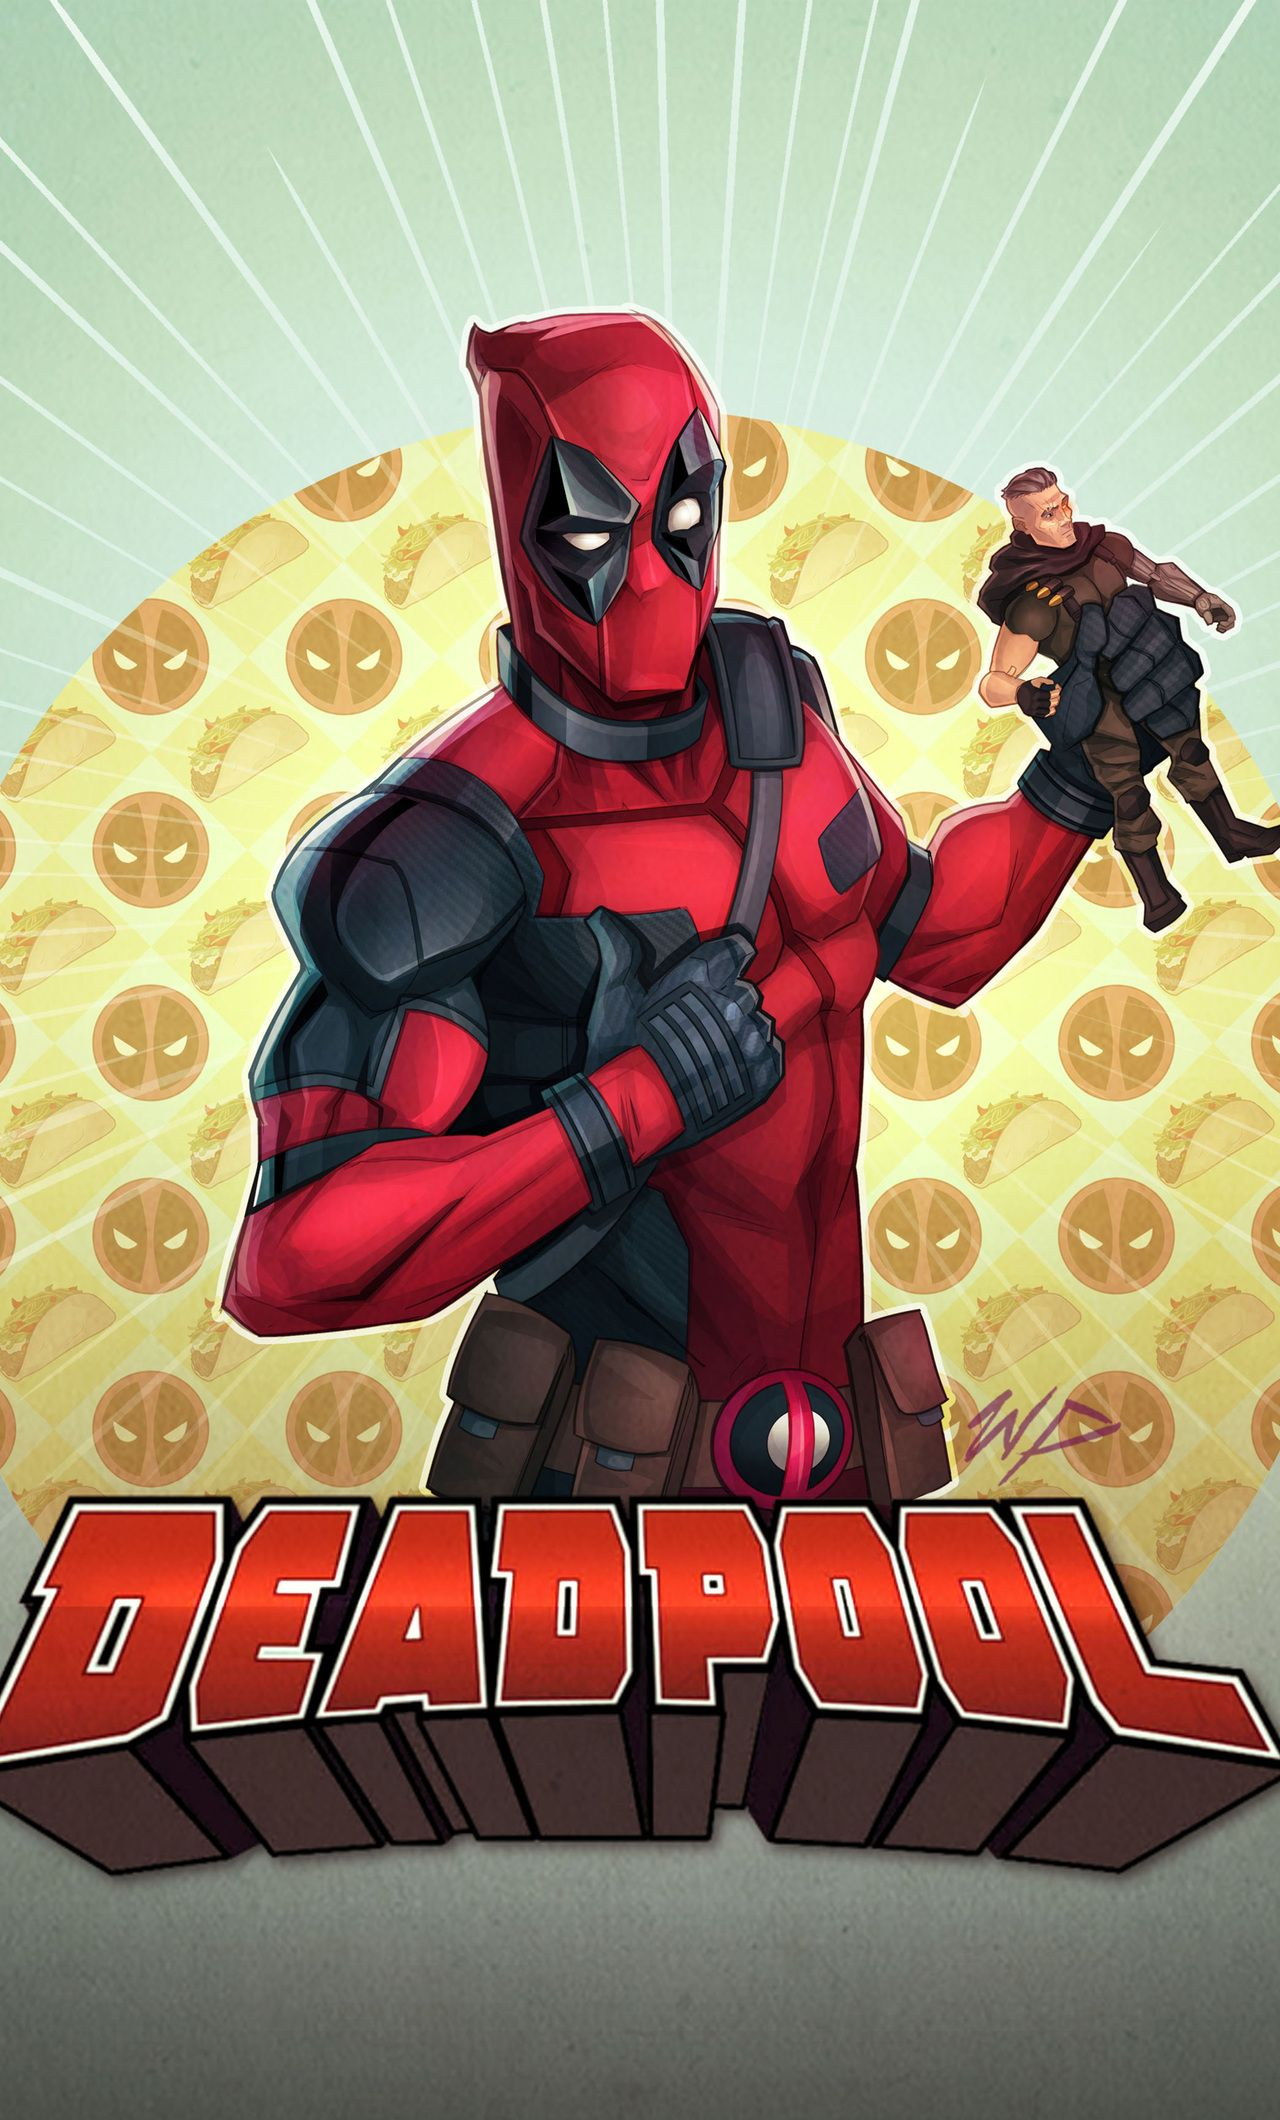 Deadpool 2 Iphone Wallpapers Top Free Deadpool 2 Iphone